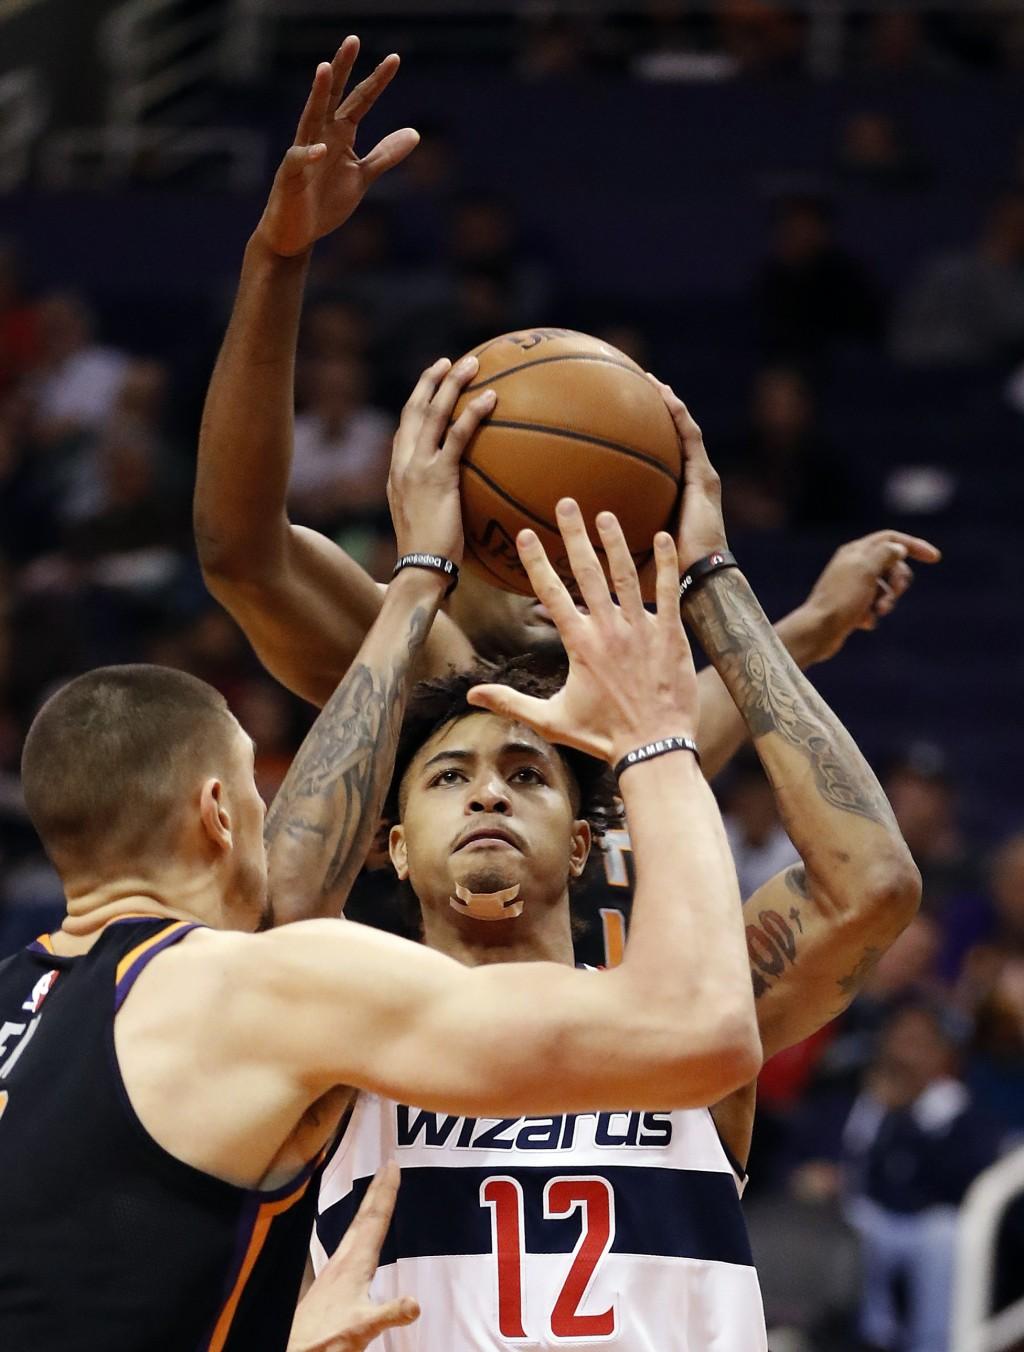 Washington Wizards forward Kelly Oubre Jr. (12) shoots over Phoenix Suns center Alex Len during the first half of an NBA basketball game, Thursday, De